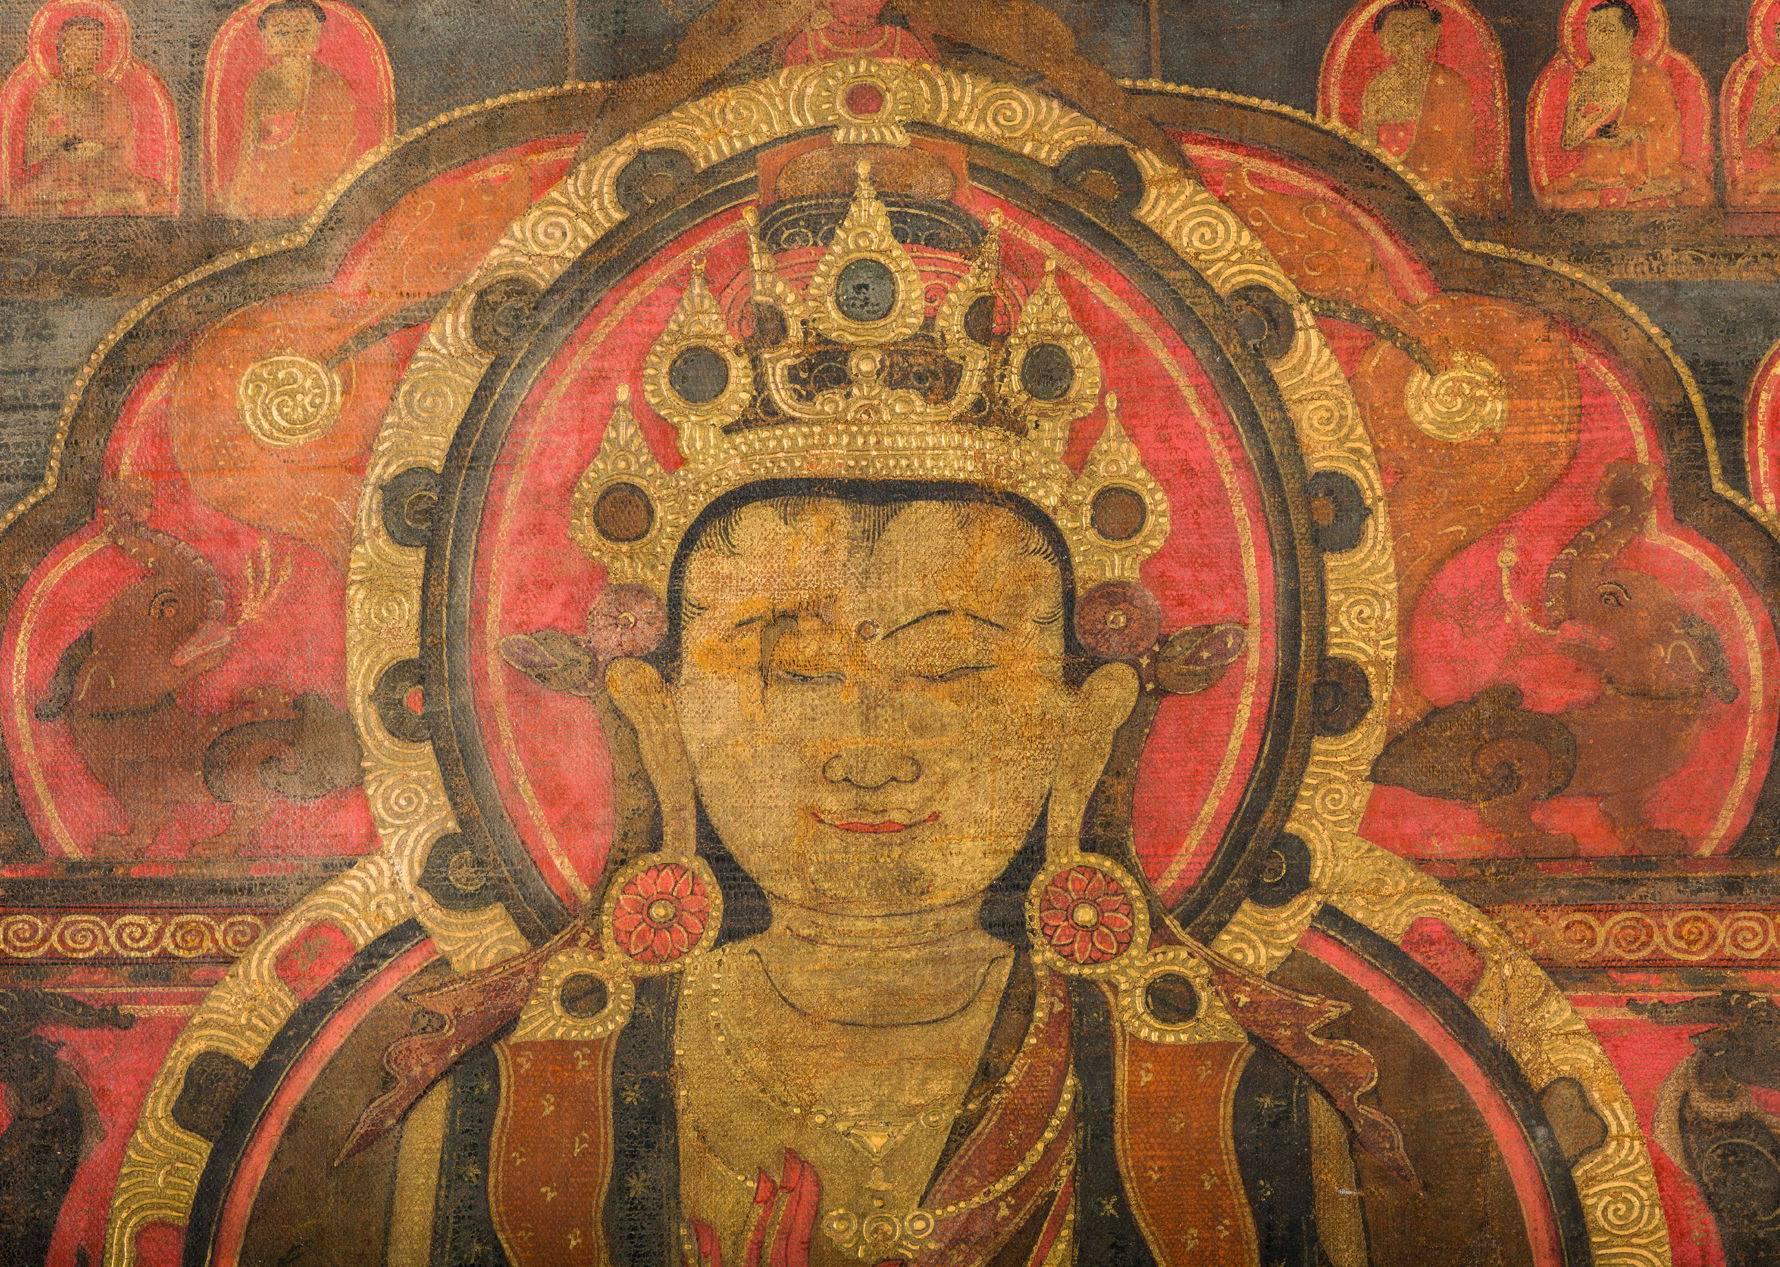 Budapest Hopp Museum of Asiatic Arts opens centenary exhibition